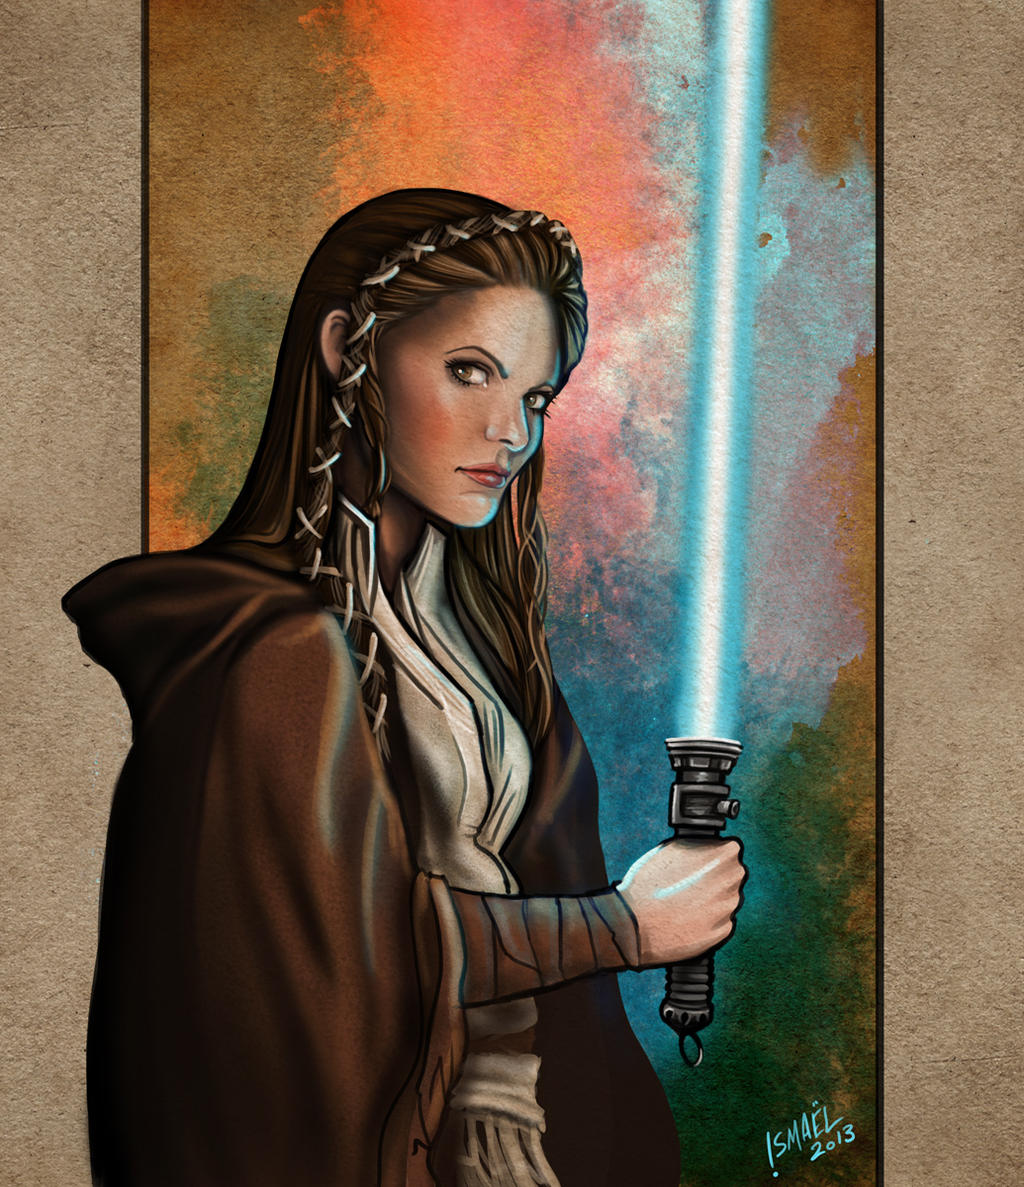 Jaina Solo Skywalker | Padme Amidala, Leia Organa y Jaina ... |Star Wars Episode 7 Jaina Solo